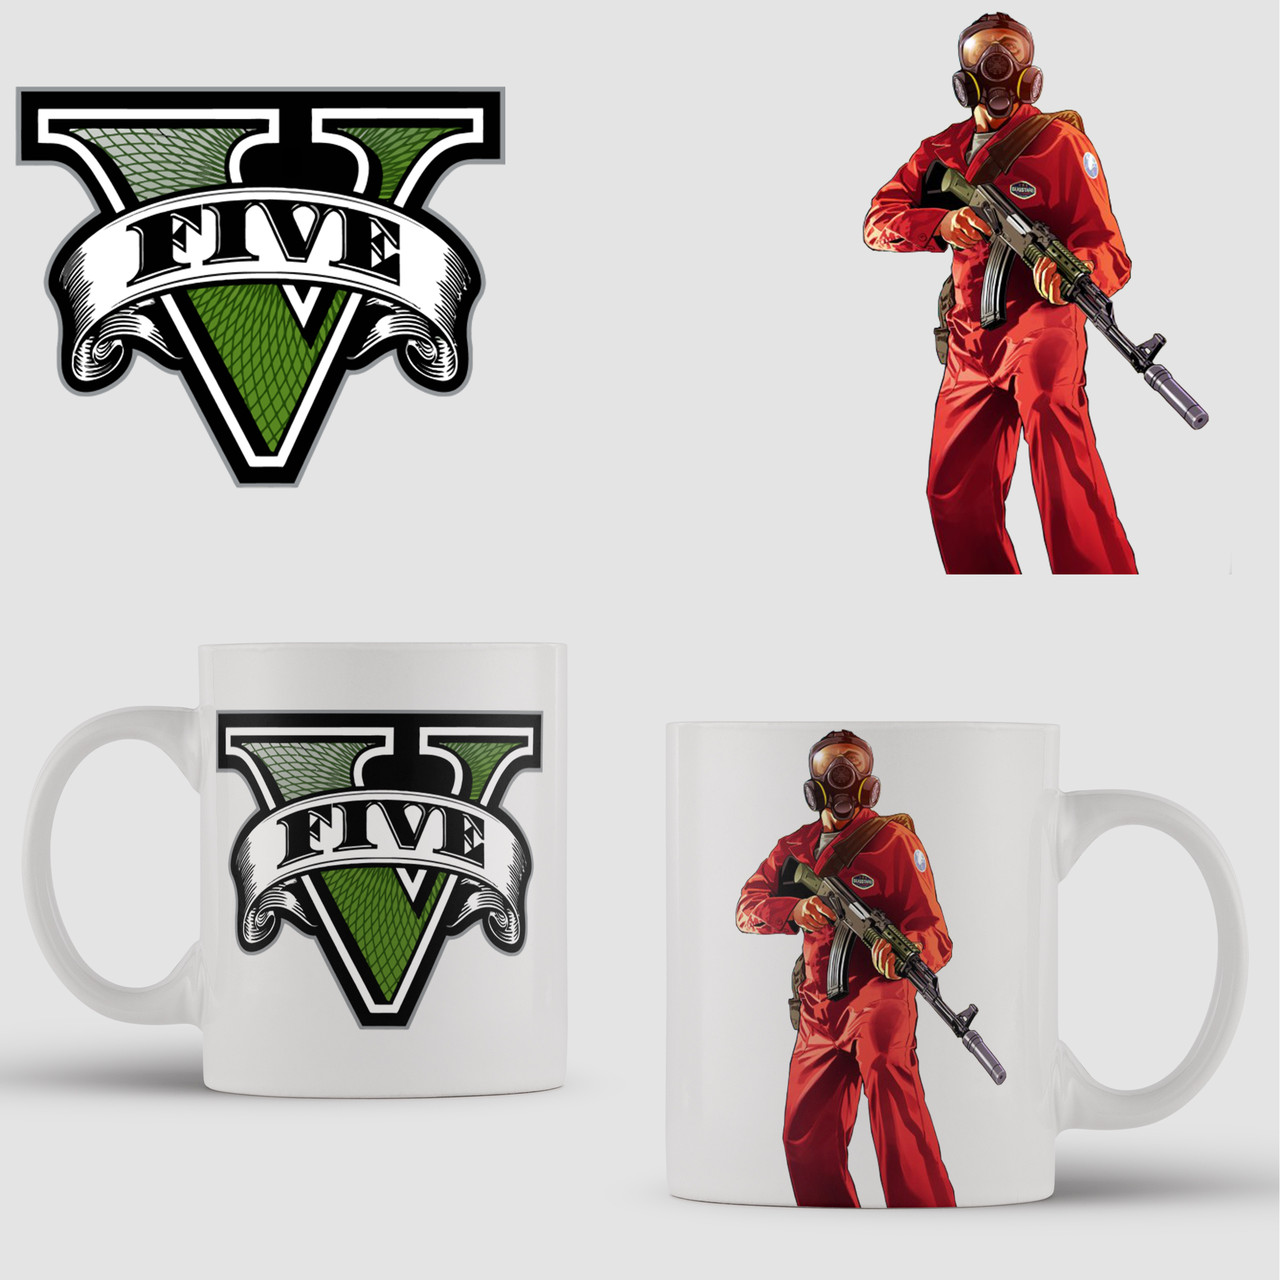 Кружка с принтом GTA V. ГТА 5. Чашка с фото